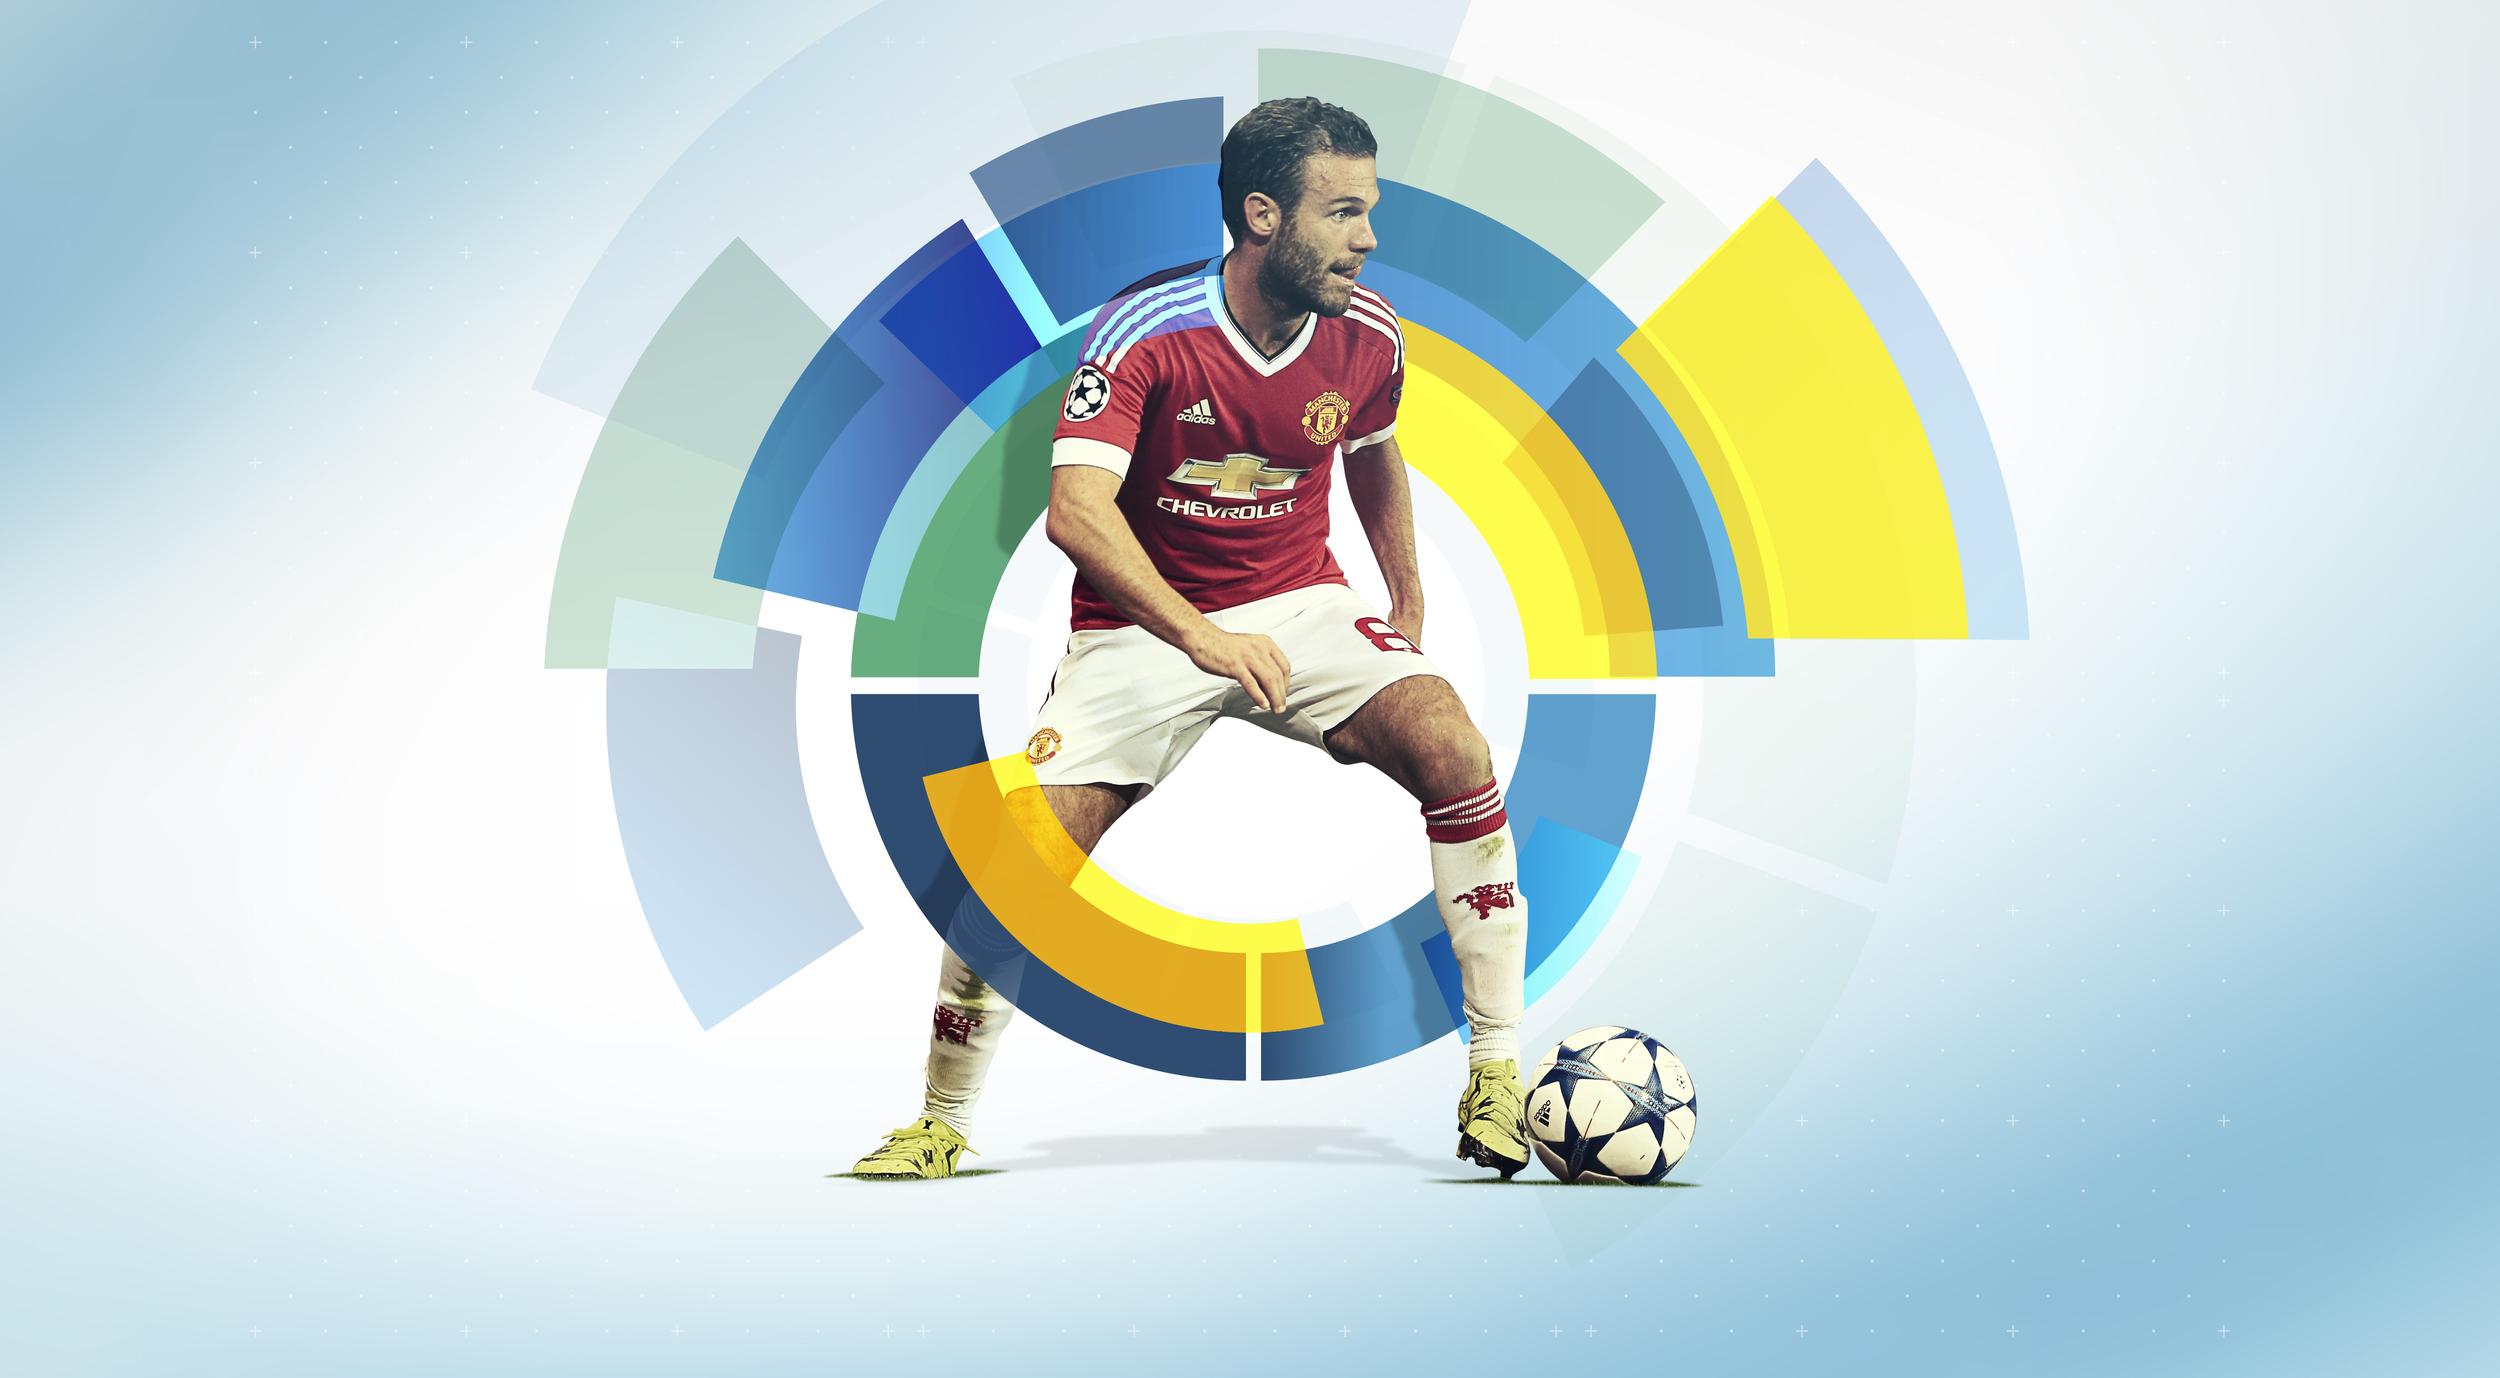 Football_Treatment_V8.jpg